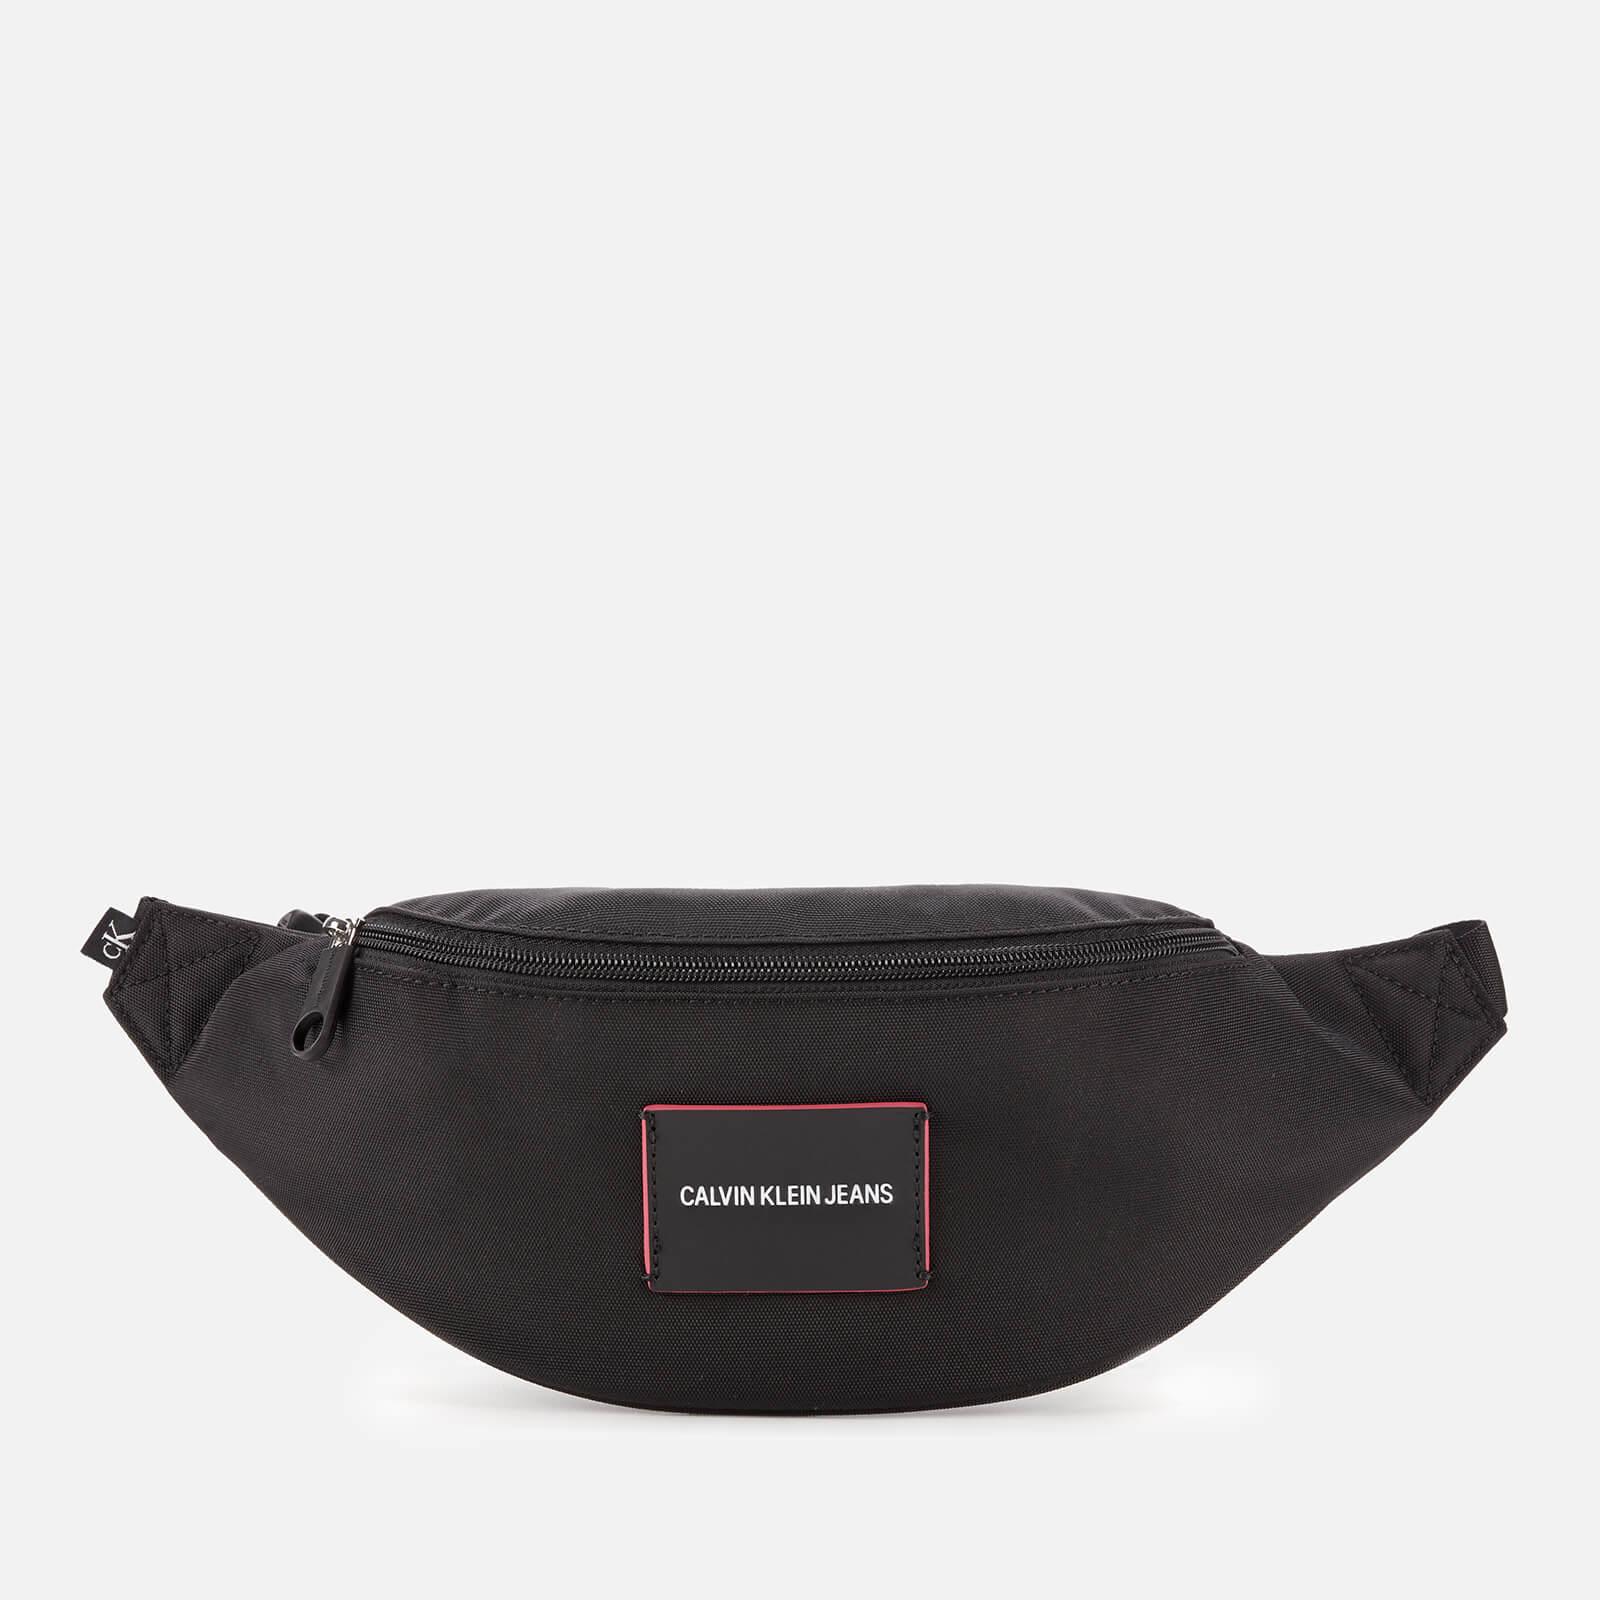 calvin klein jeans women's waist bag - black